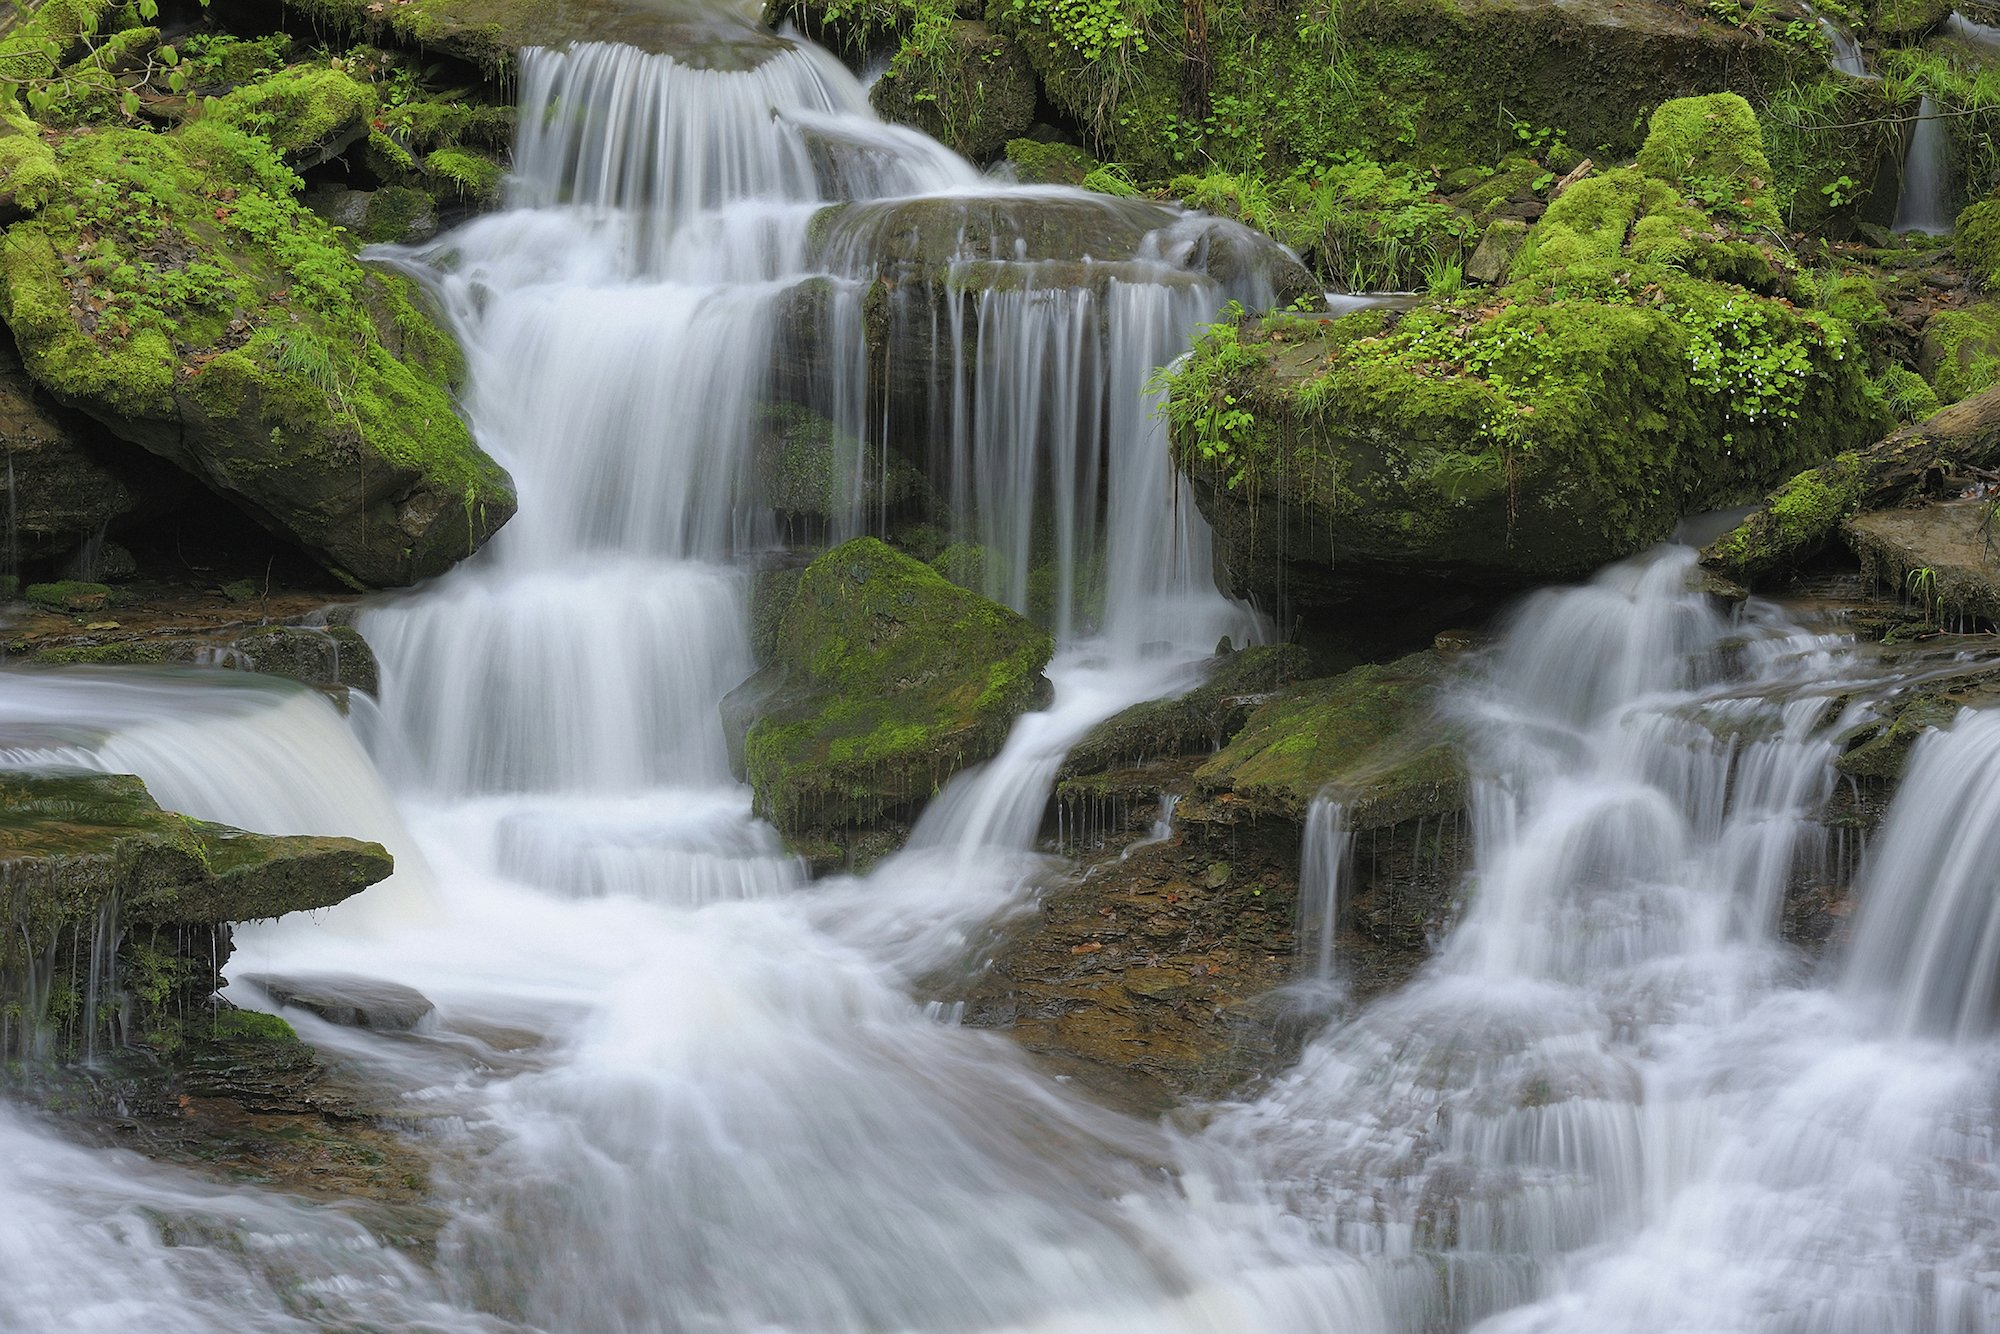 1Wall - Waterfall Giant - Wall Mural